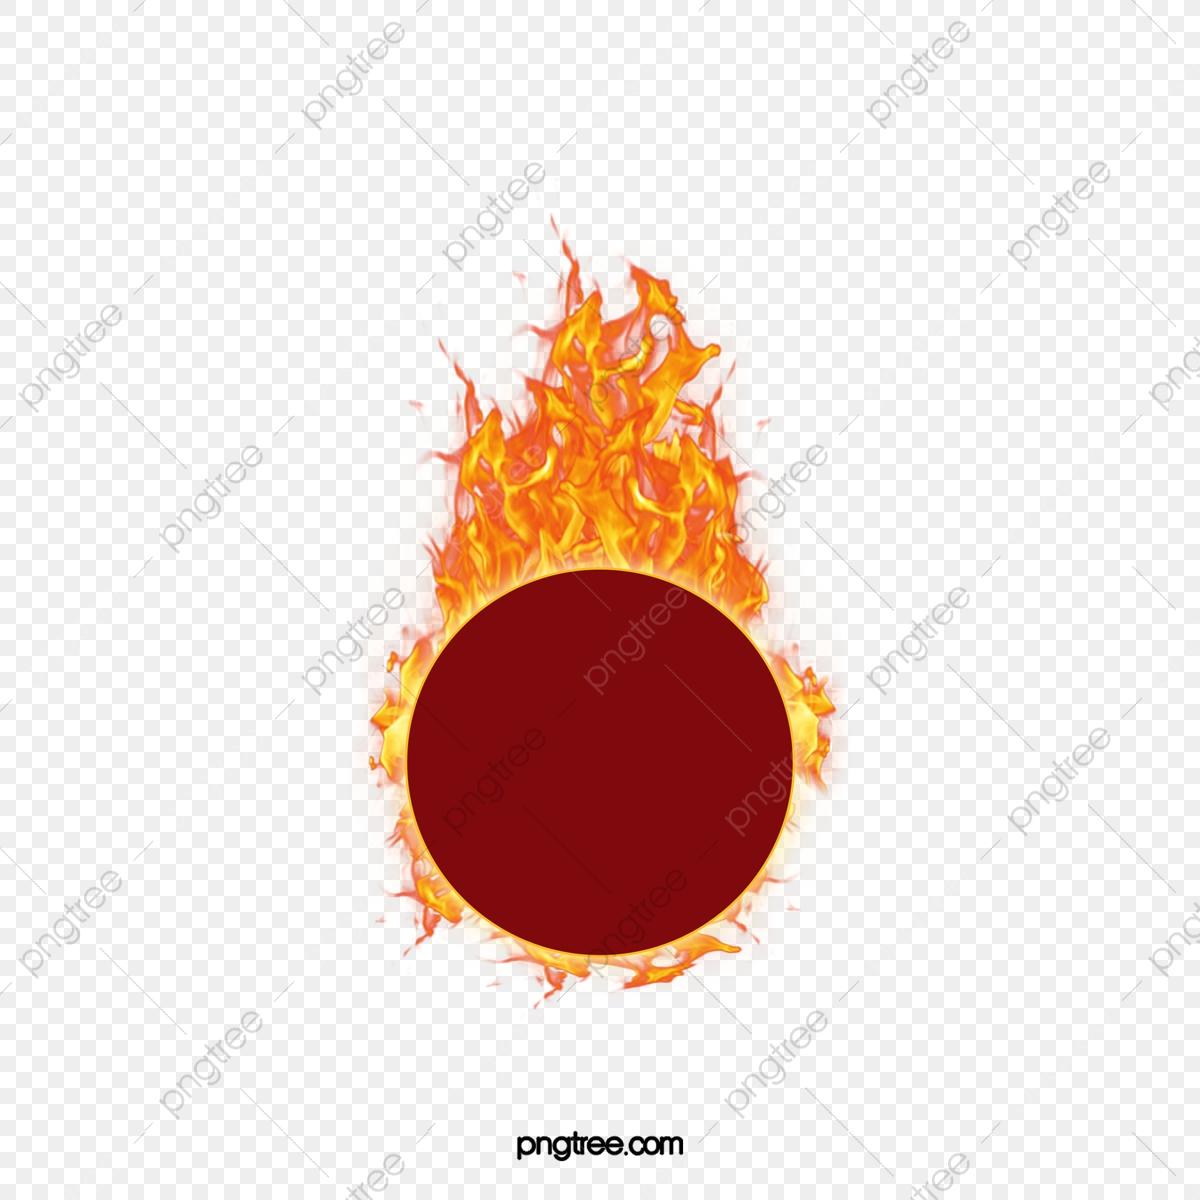 Fireball clipart campfire. Logo taobao material fire